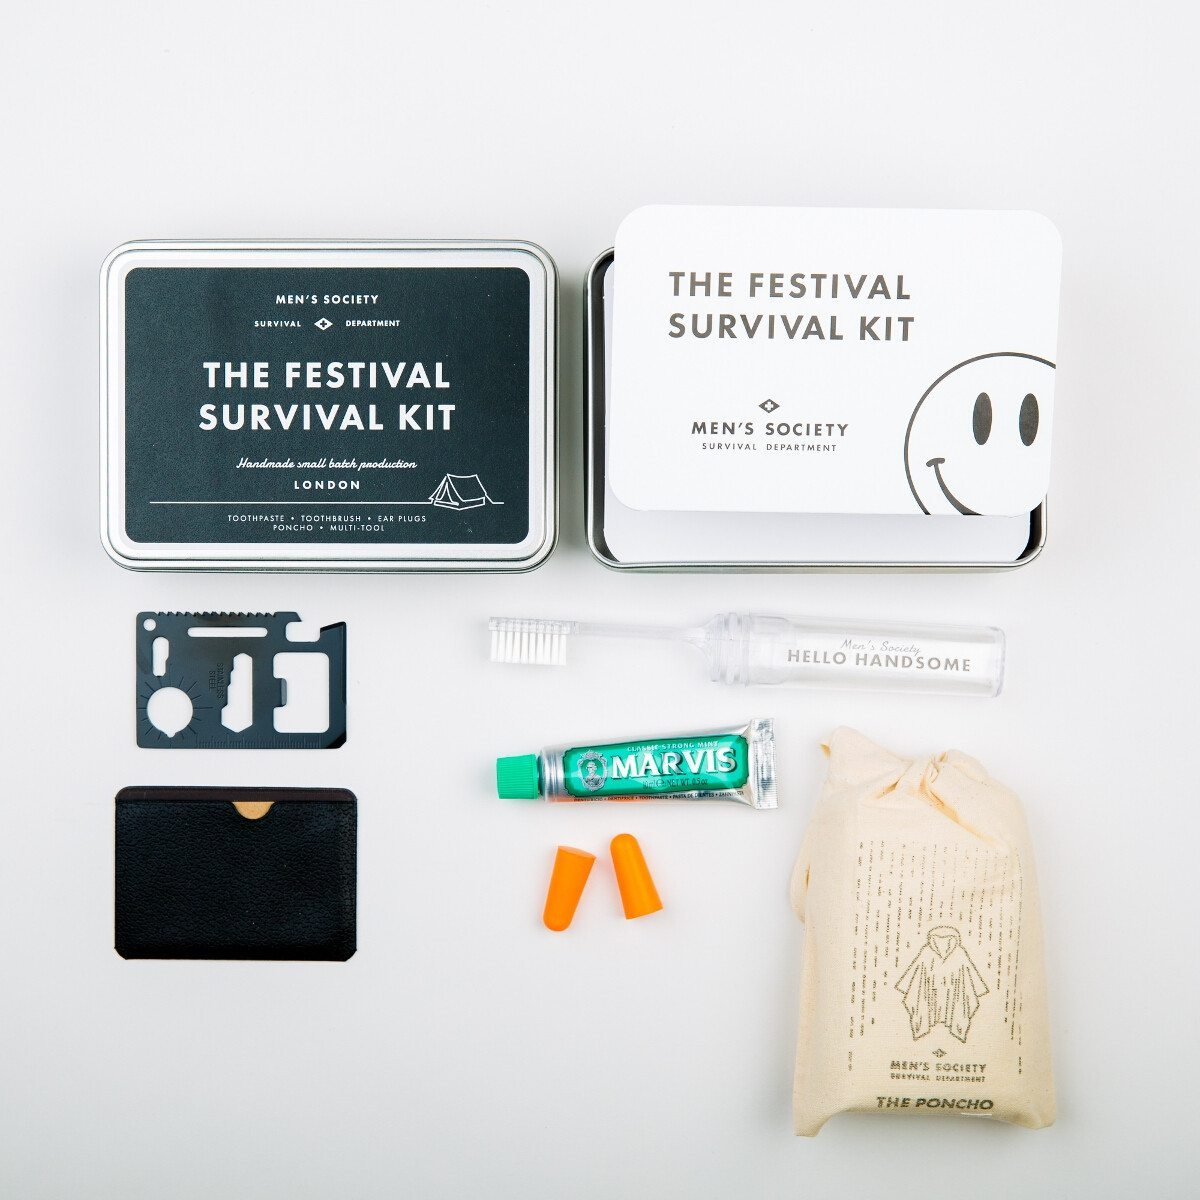 The Festival Survival Kit